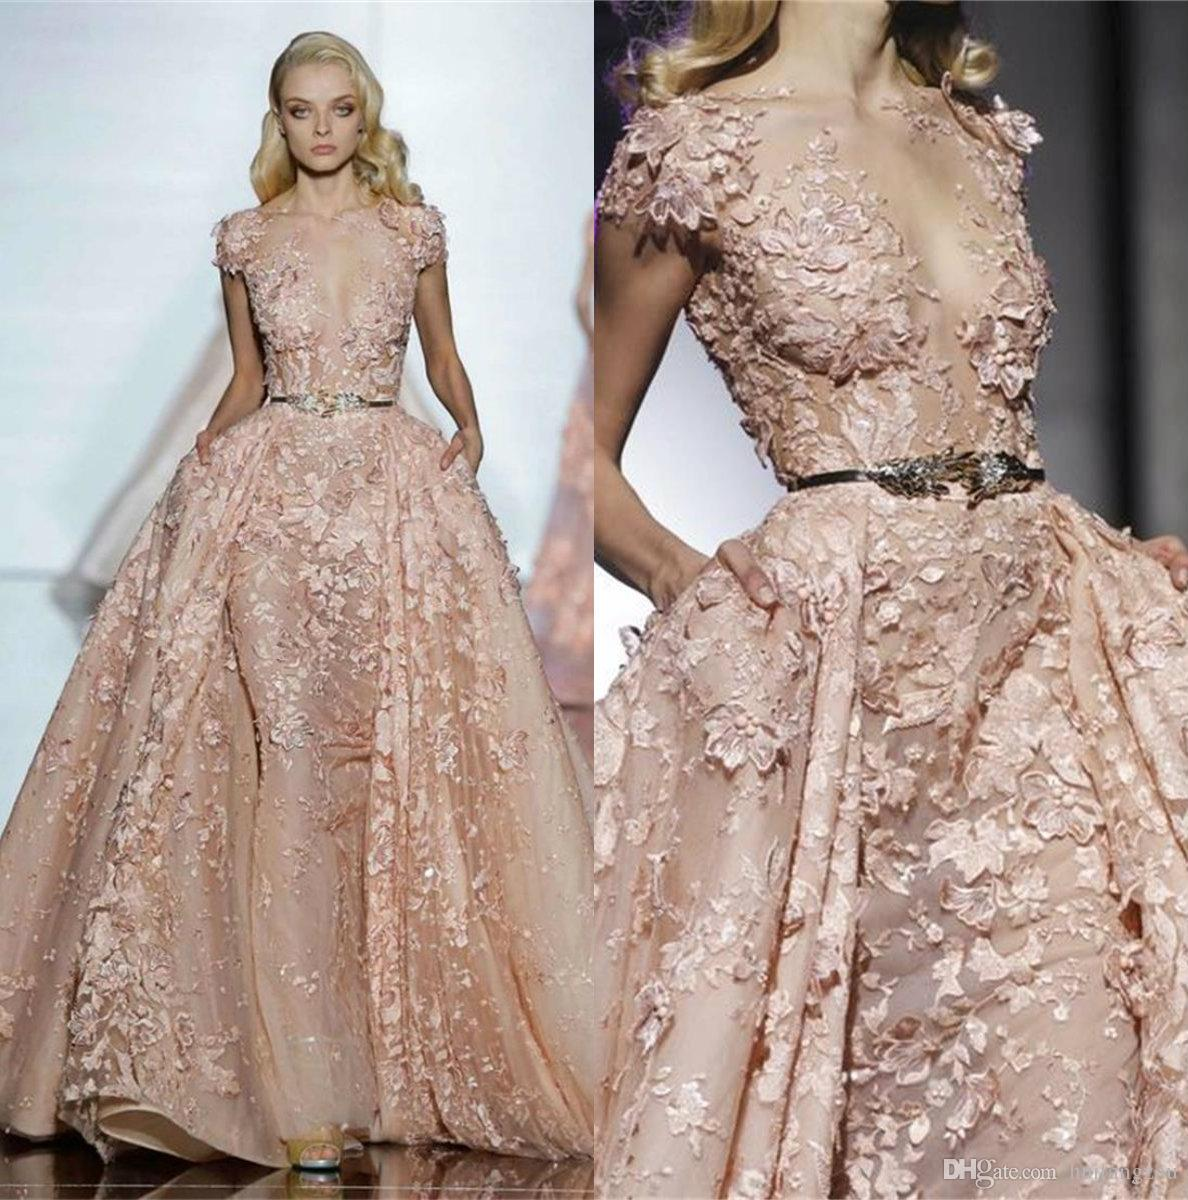 82b614711988 Zuhair Murad Elegant Blush Pink Prom Dresses With Overkskirt Exquisite Lace  Applique Evening Gowns Party Formal Wear Leaf Belts Designer Prom Dresses  ...